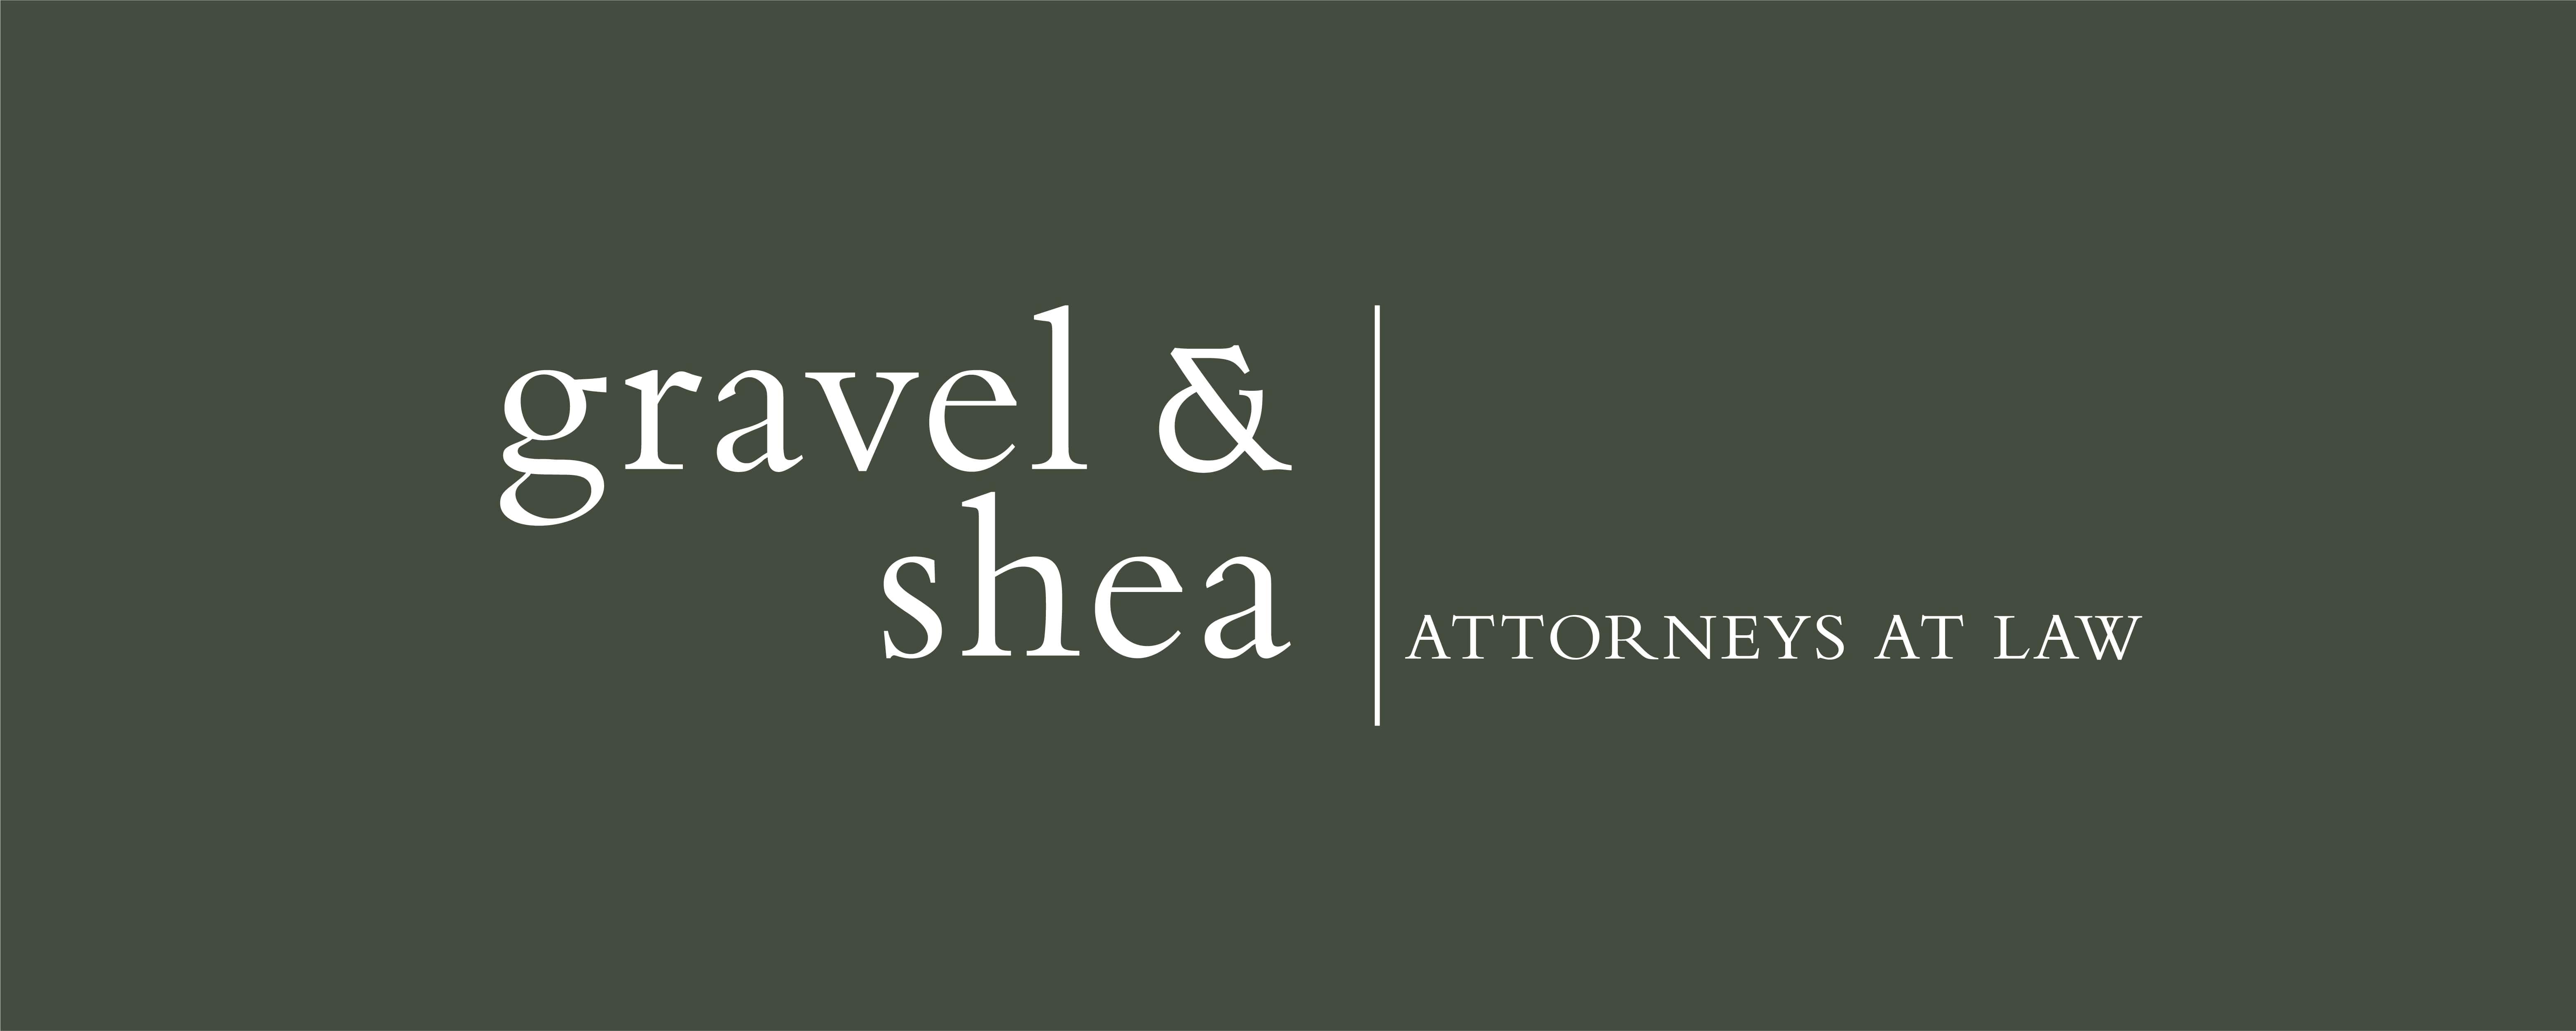 Gravel and Shea Identity